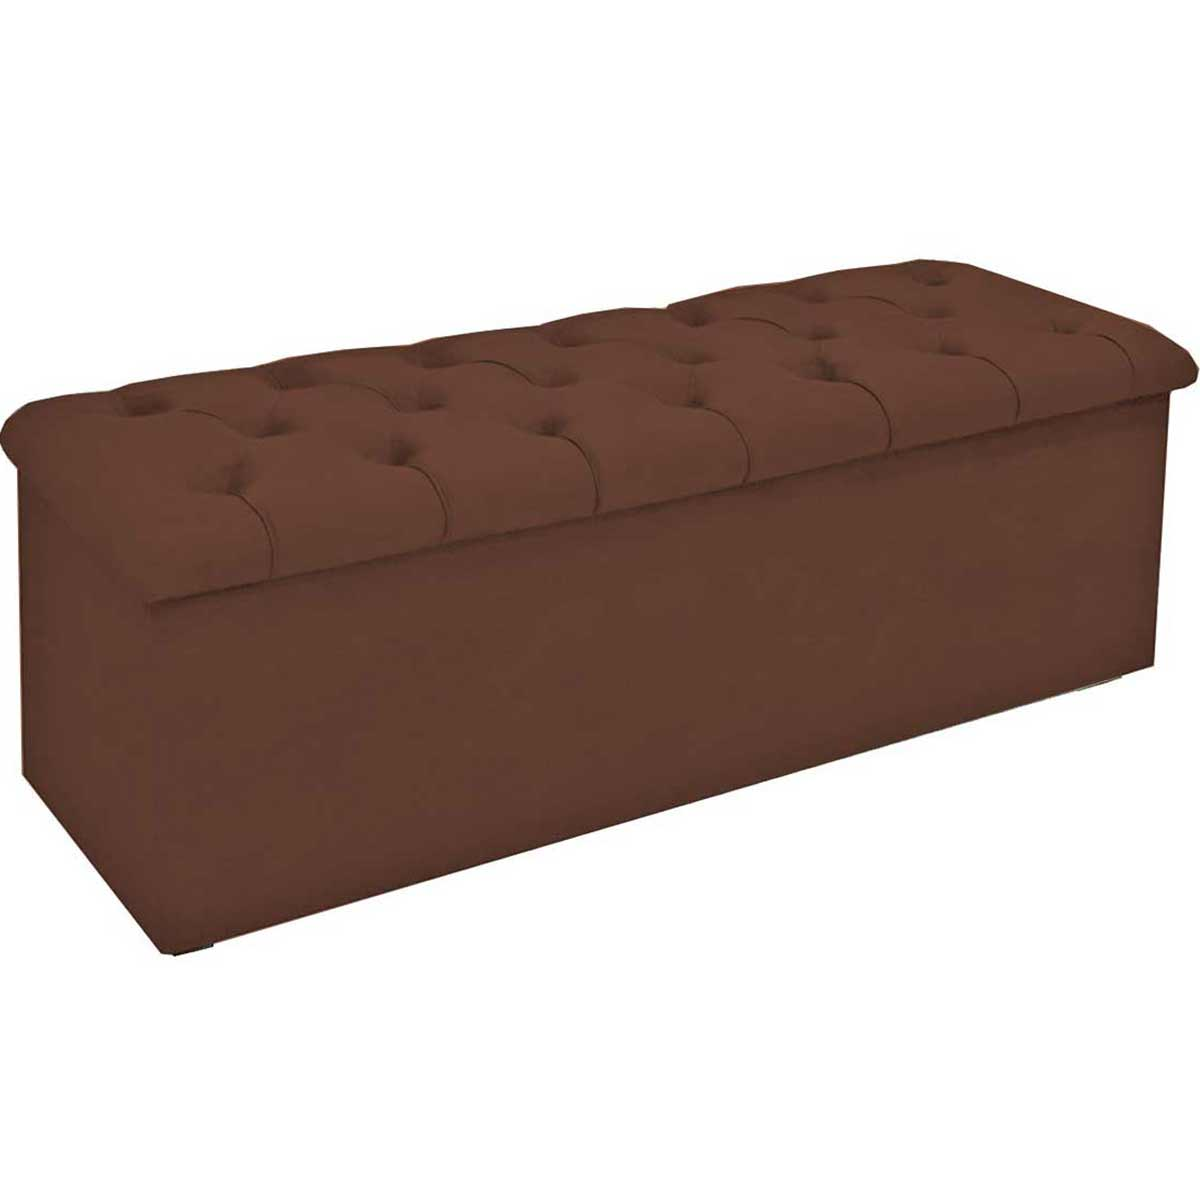 Calçadeira com Baú Lotus 140 cm Animale Chocolate Simbal